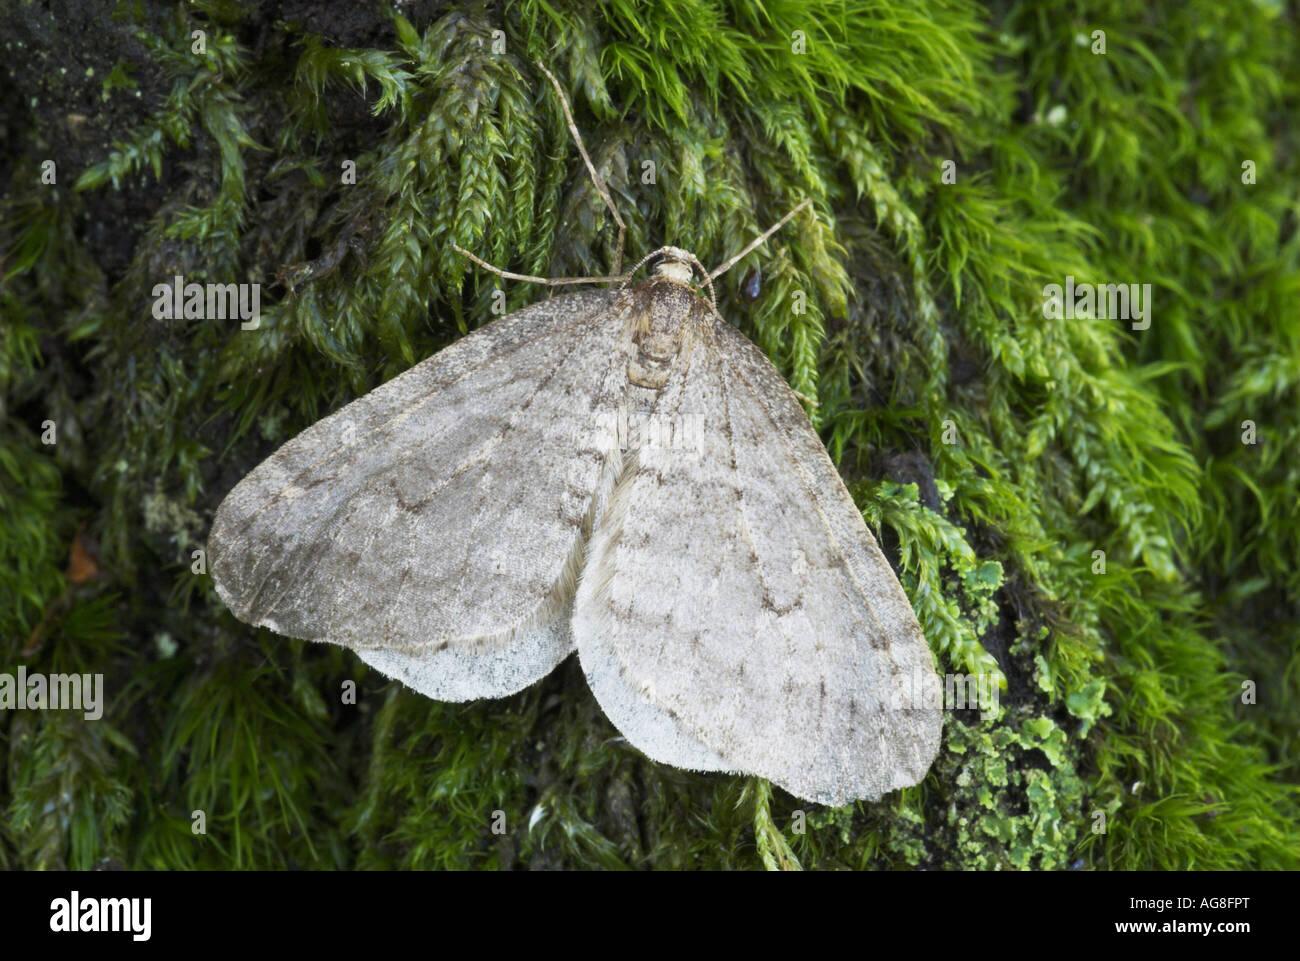 winter moth, small winter moth (Operophtera brumata, Cheimatobia brumata), sitting on moss, Germany, Saarland - Stock Image